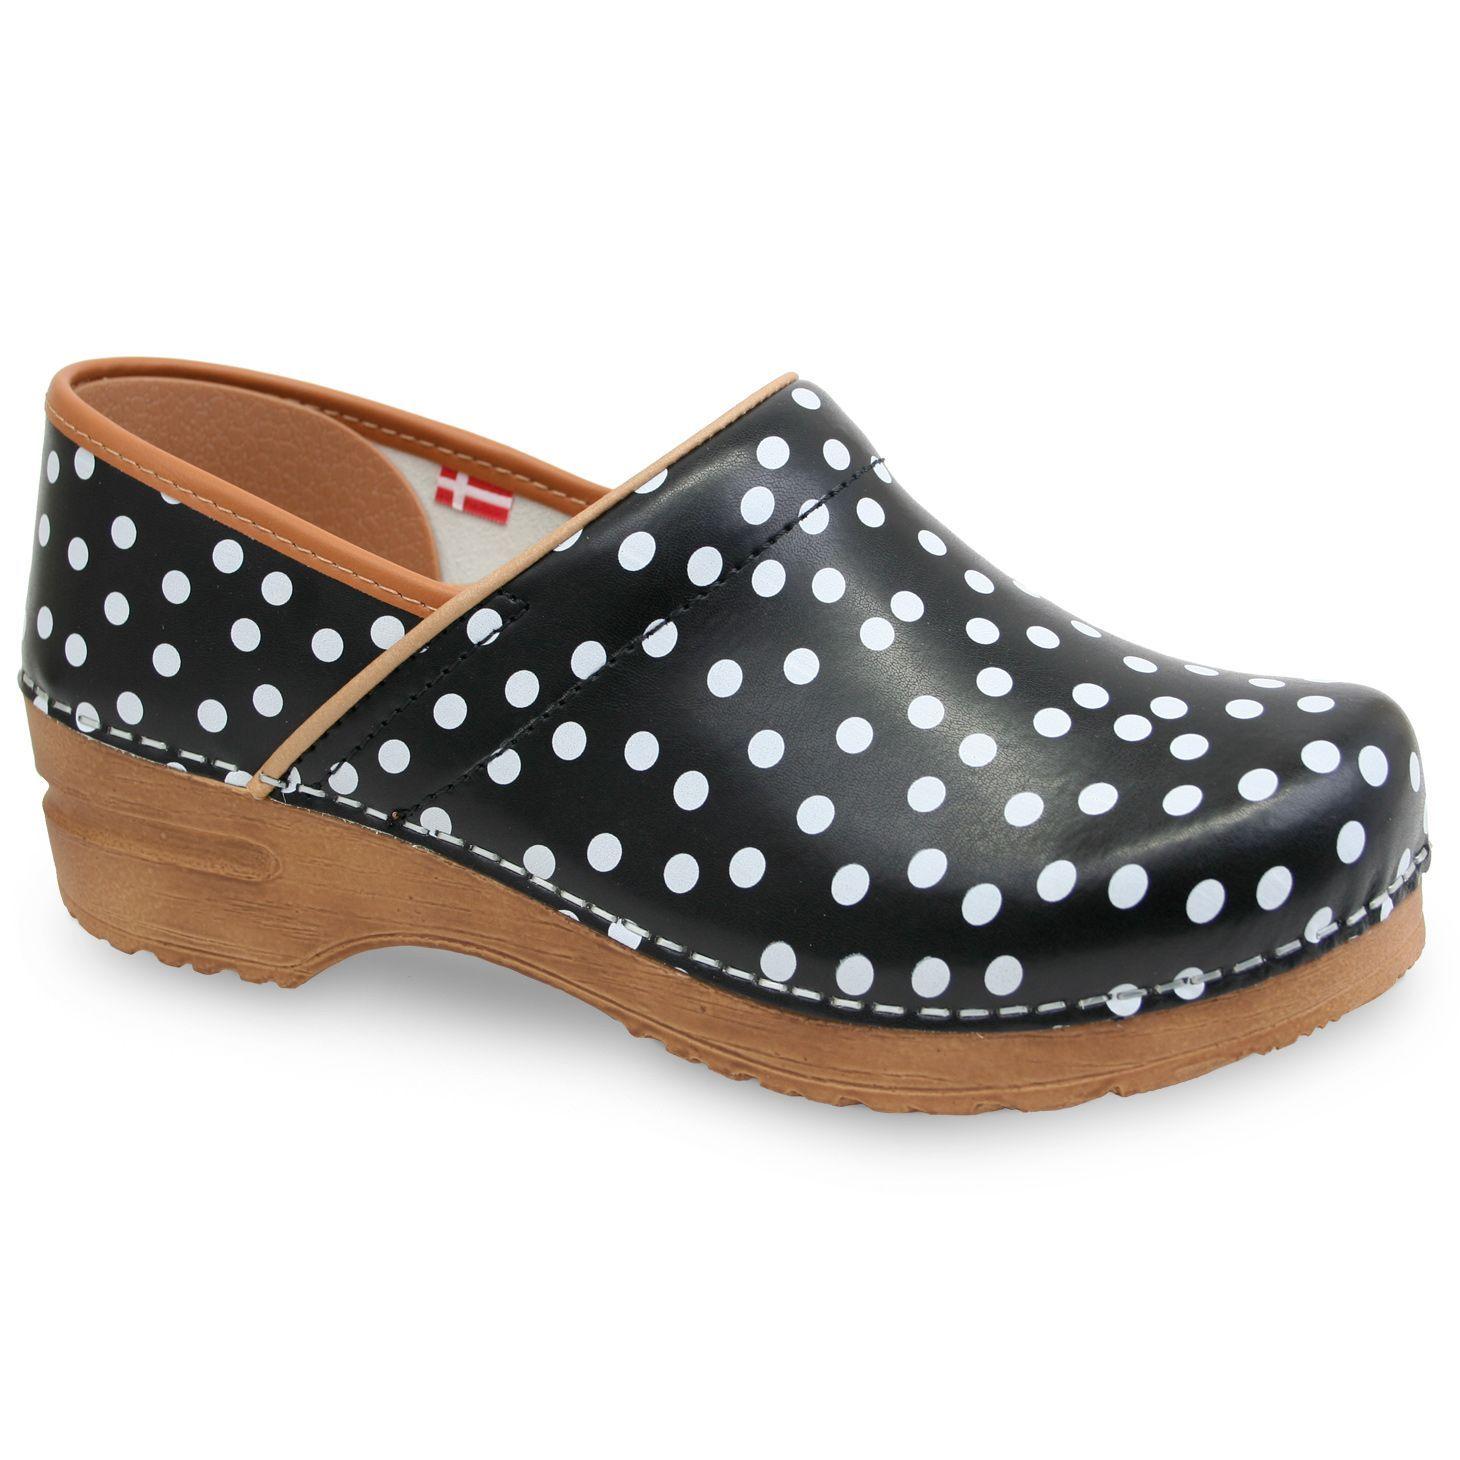 ROXBURY Women's Clogs-